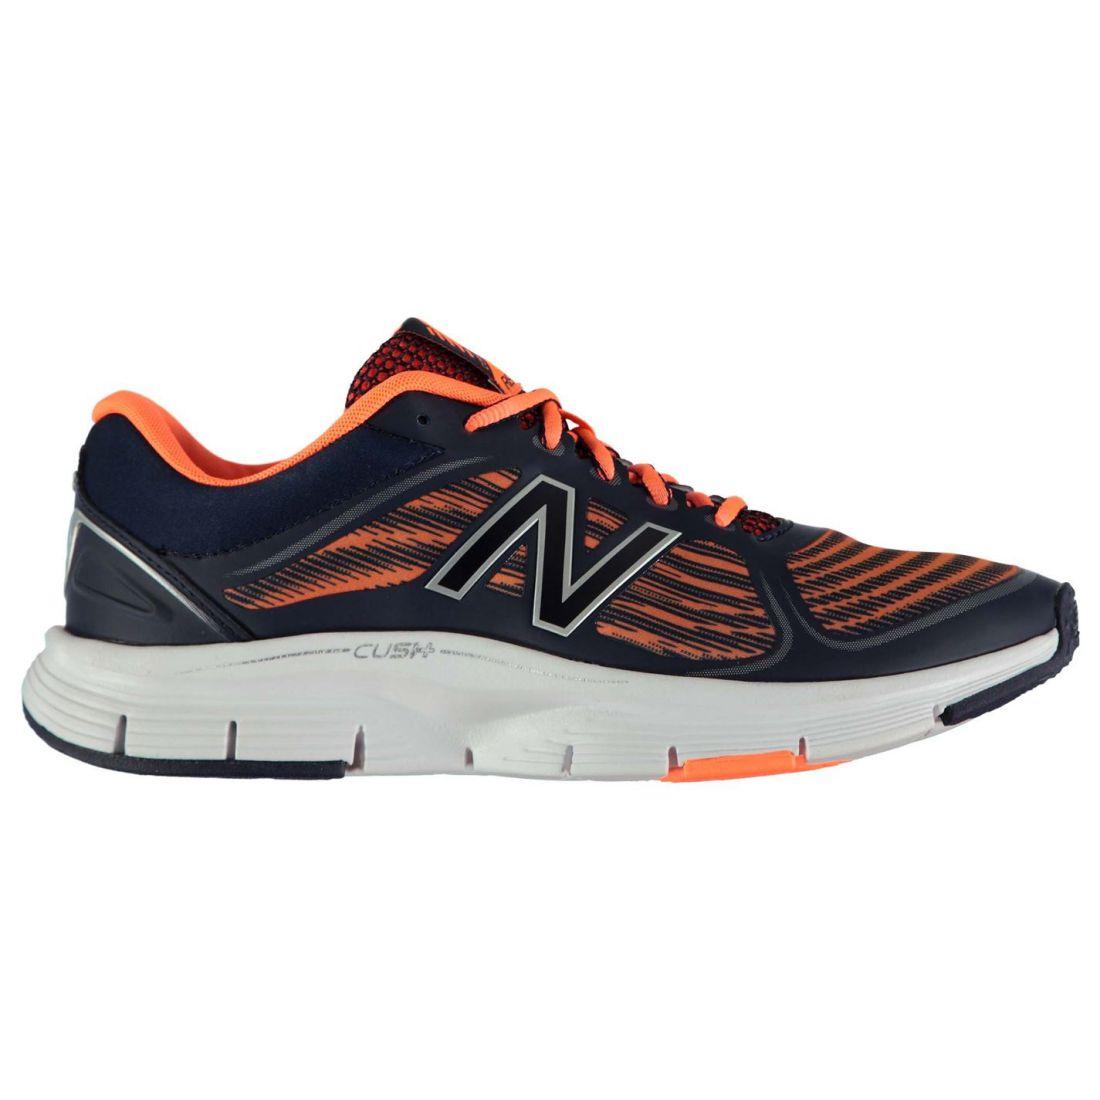 Tenis-New-Balance-RIFM-v1-para-hombre-Caballeros-De-Carretera-Zapatillas-Cordones-atados